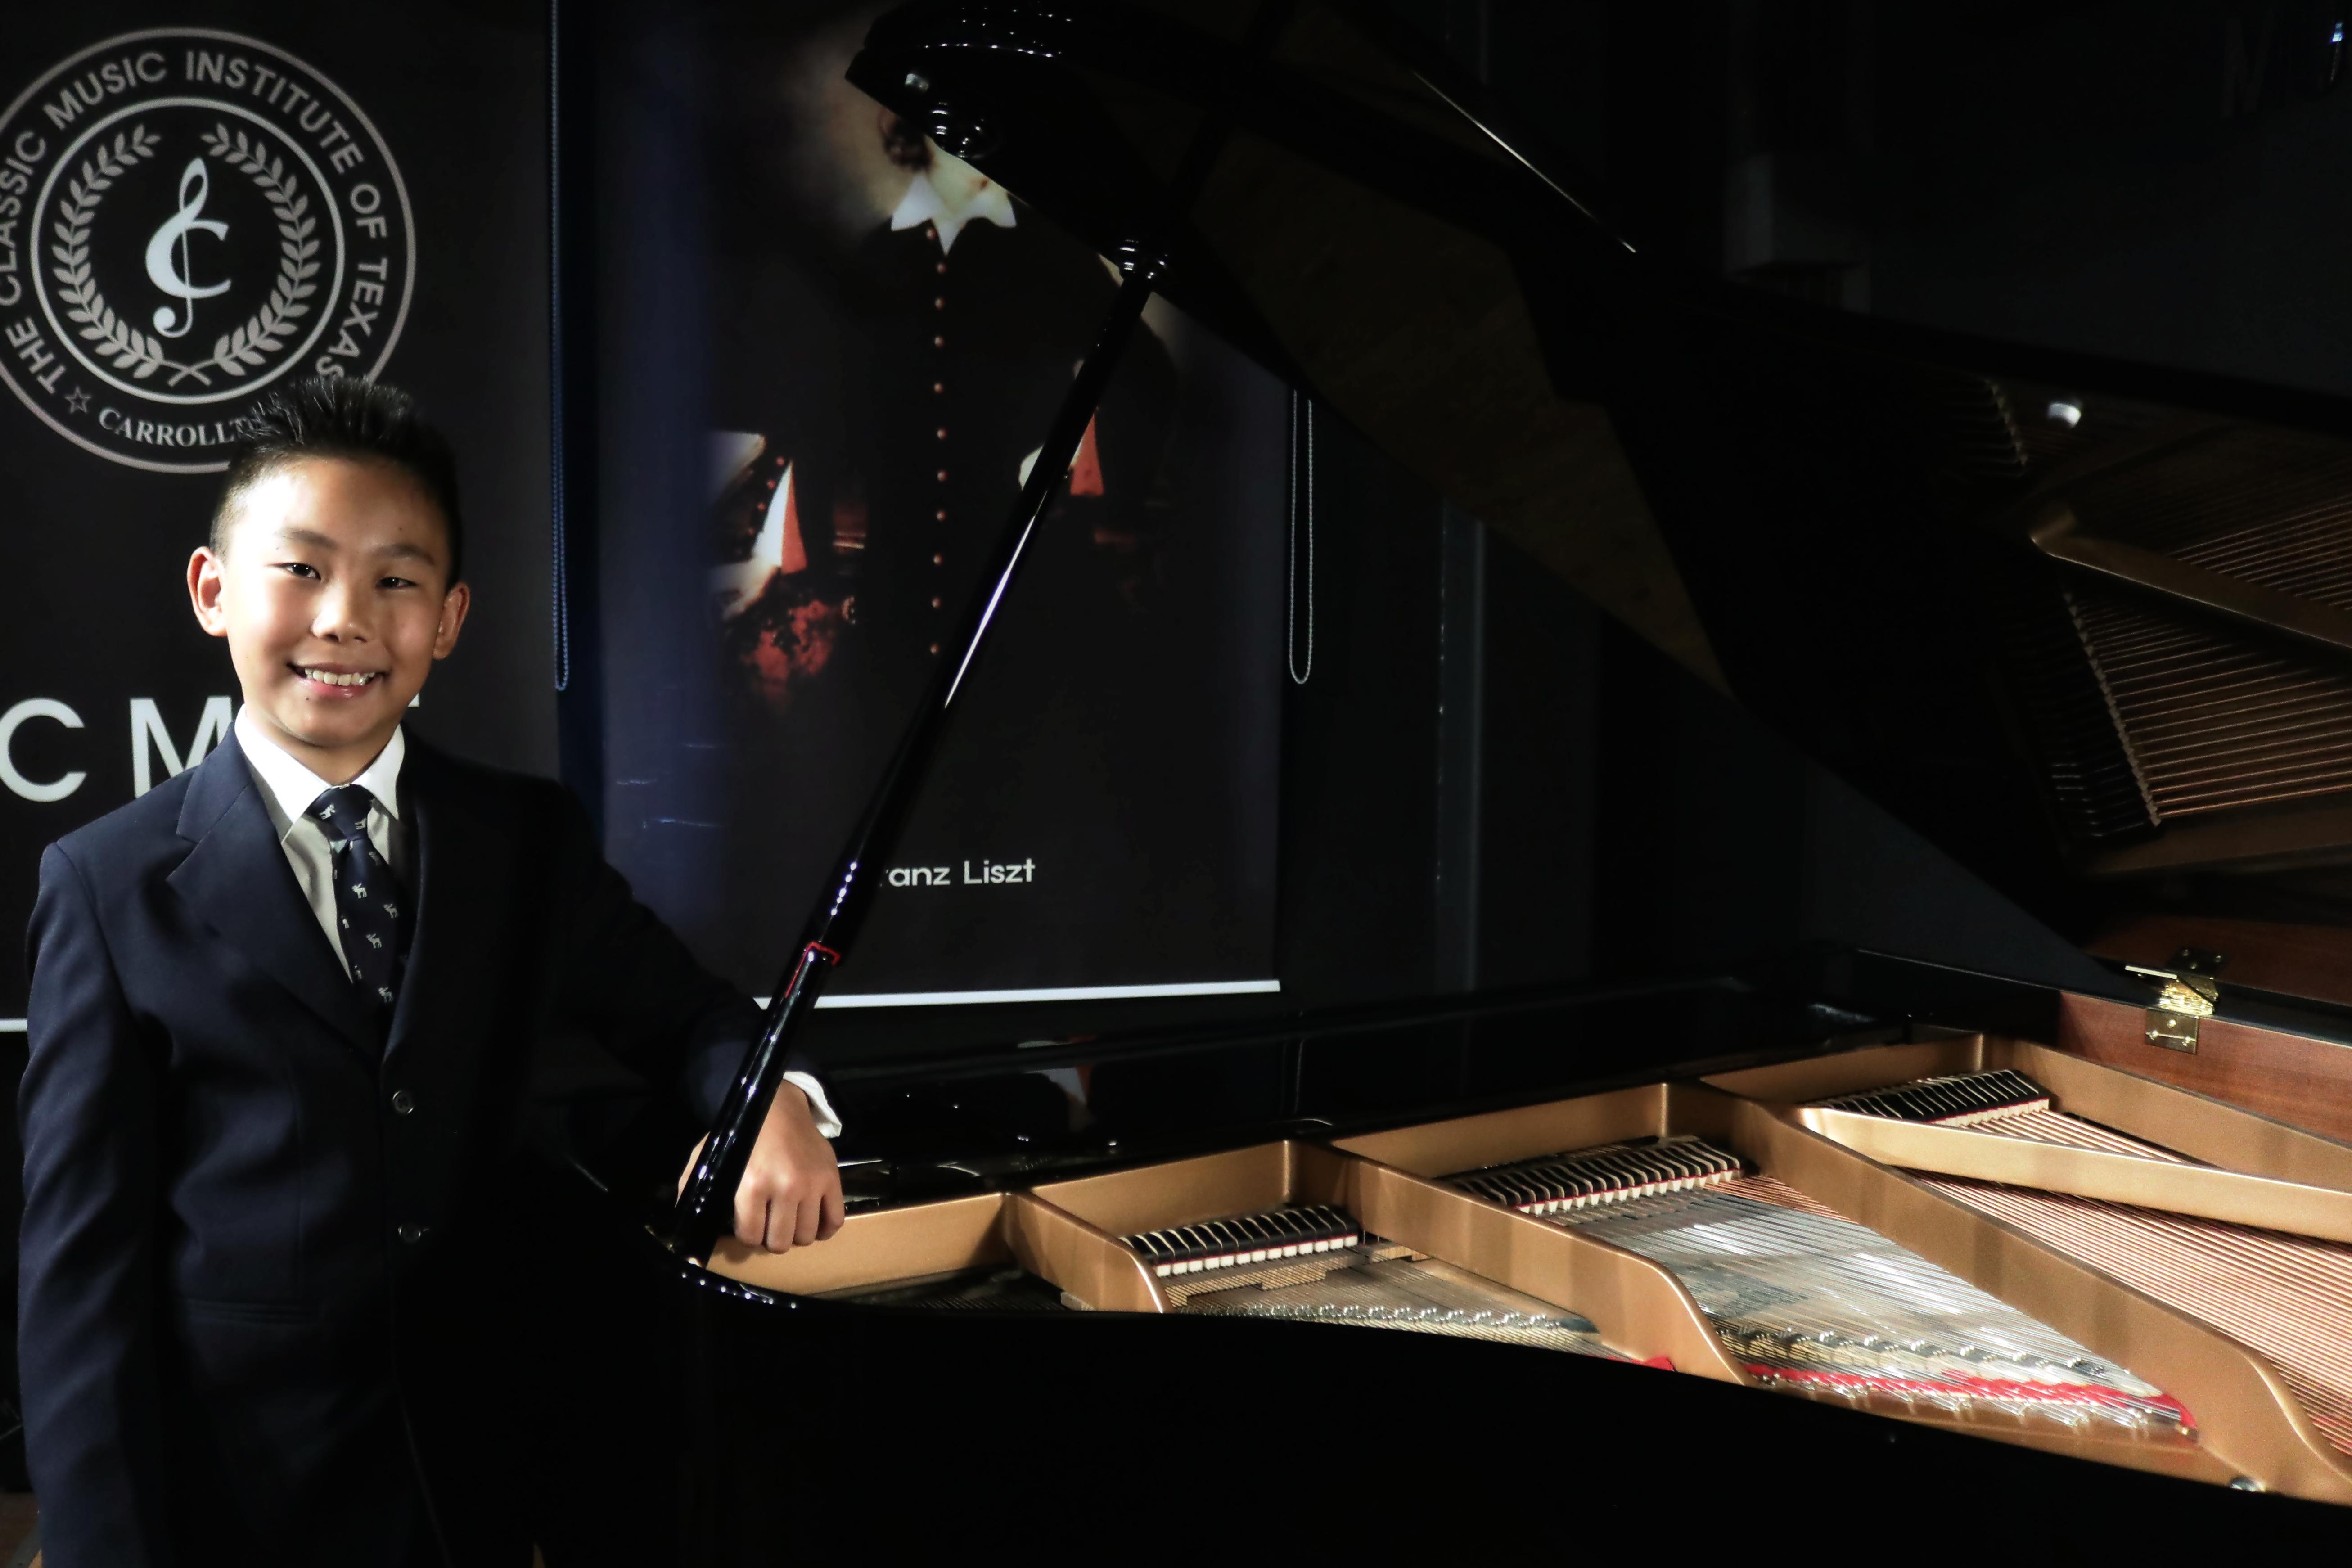 Ian Choi 4X6